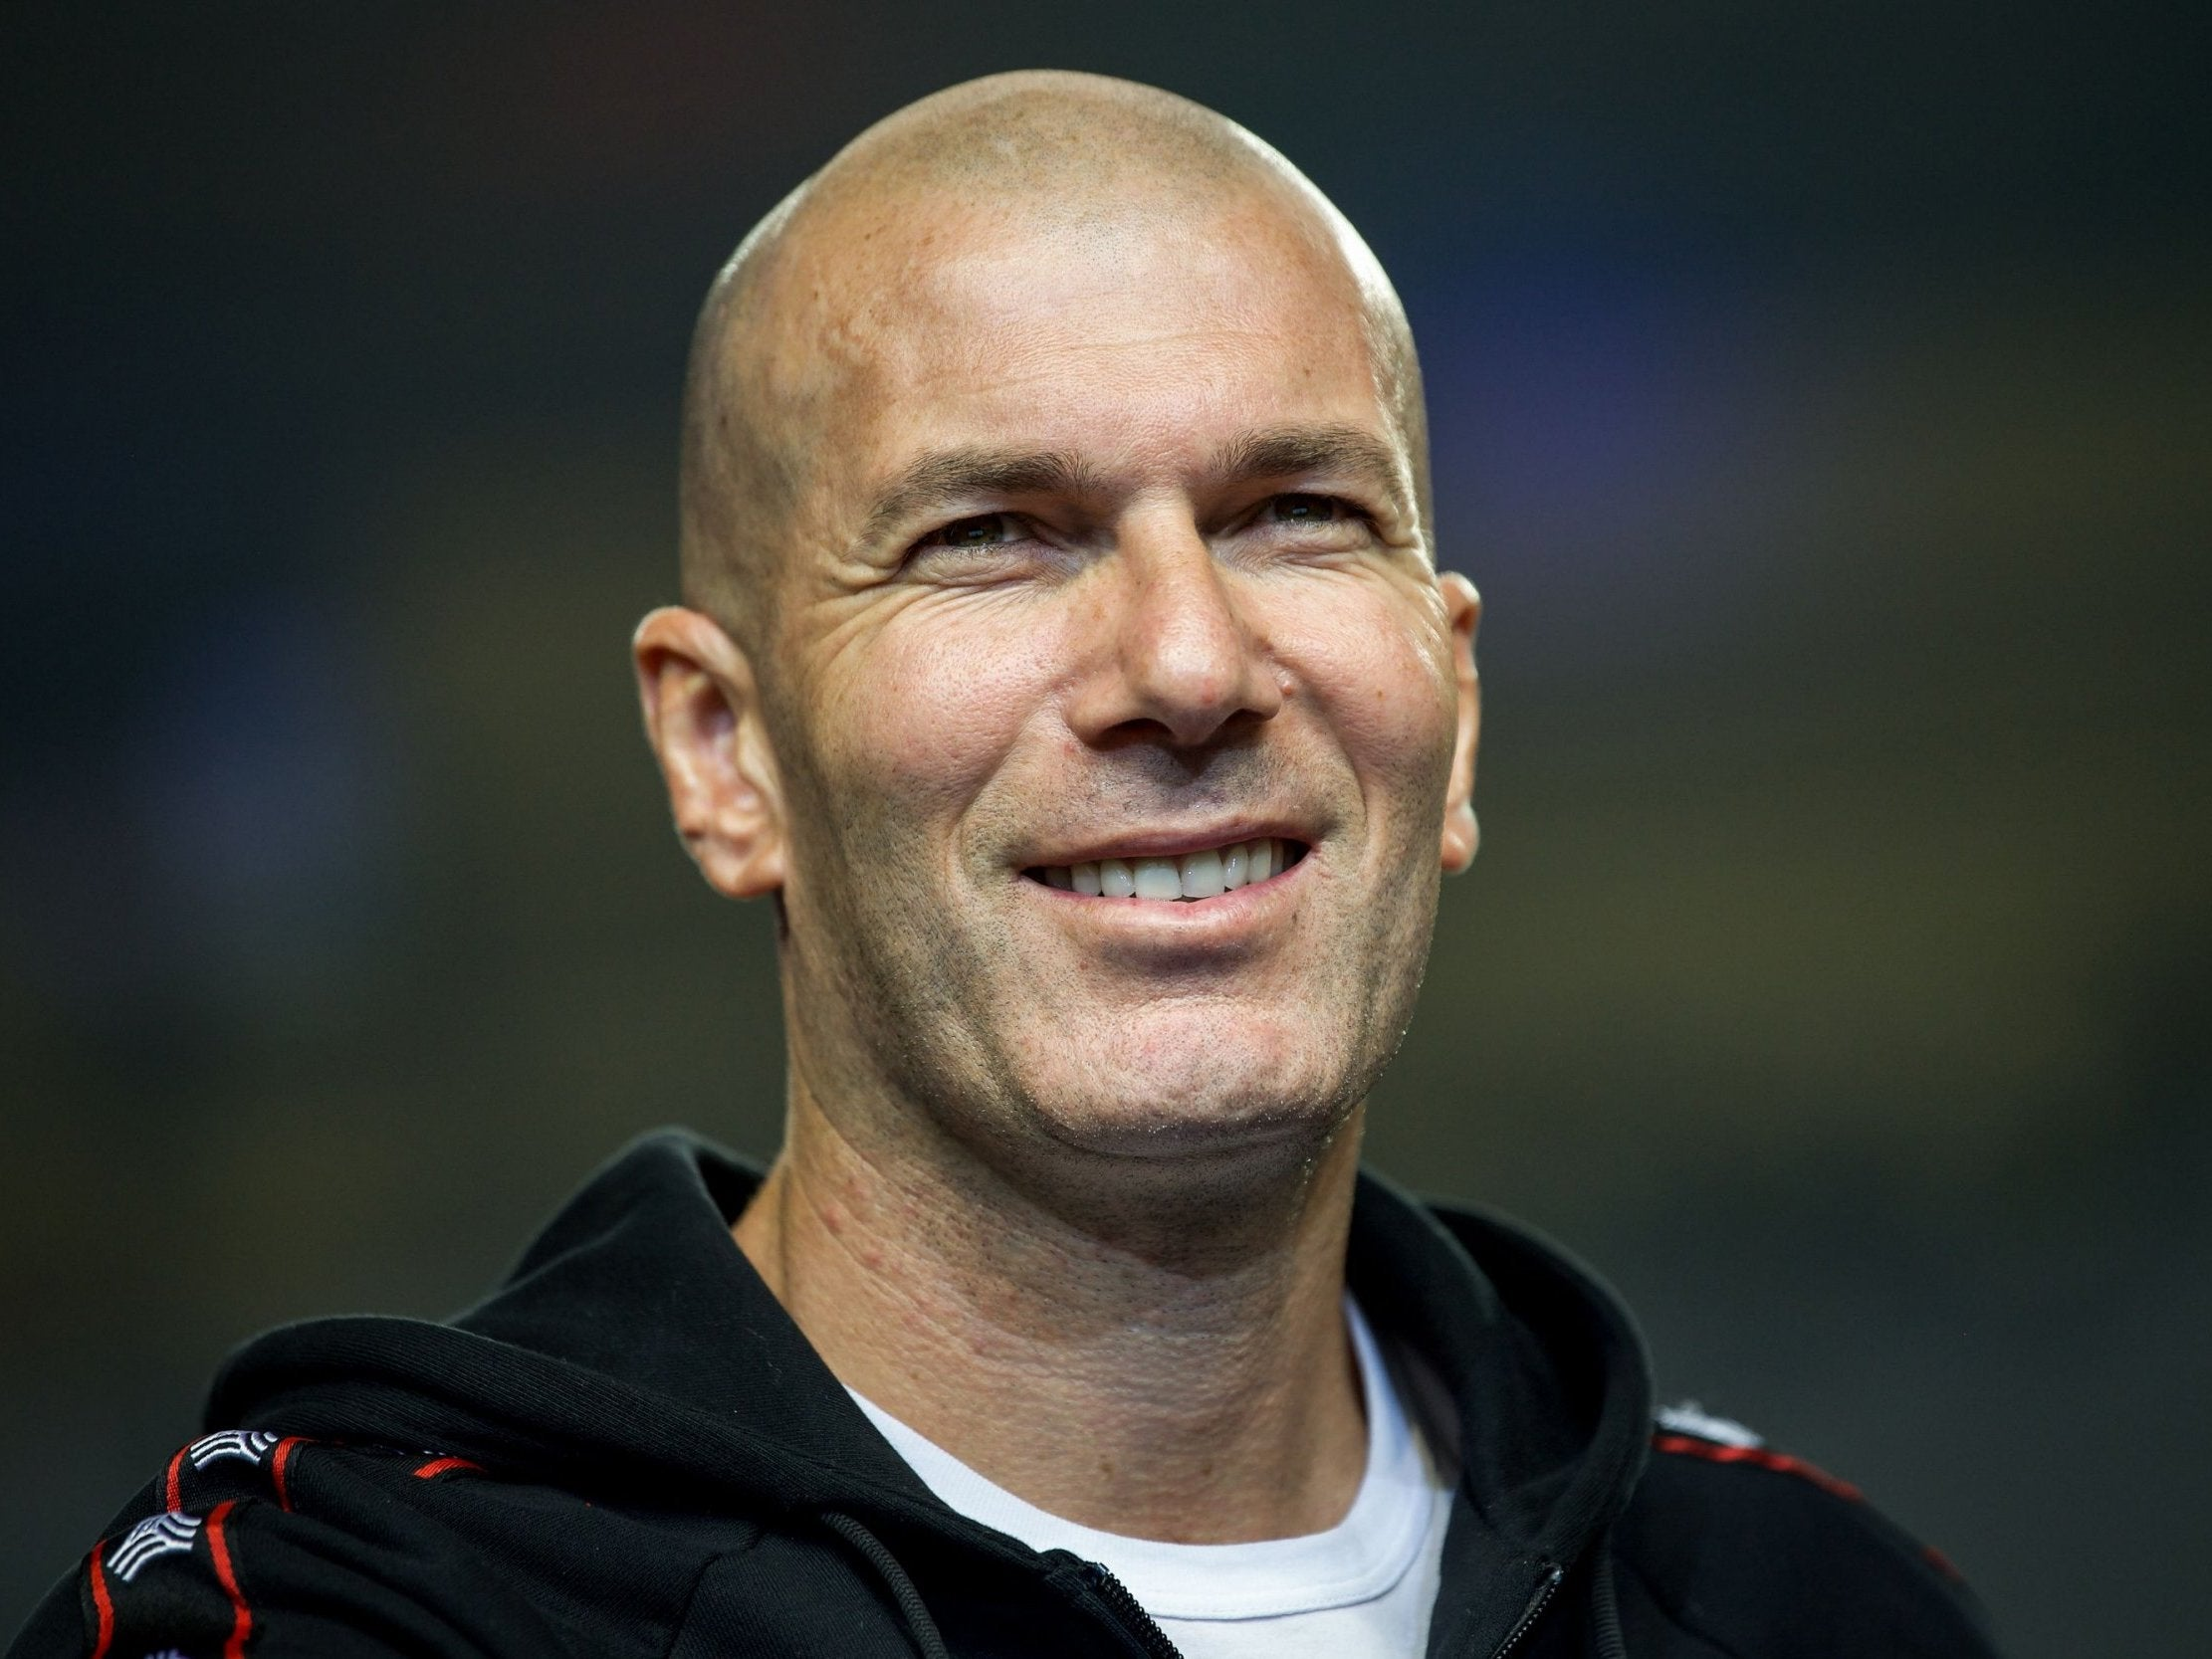 Zinedine Zidane - 12/1